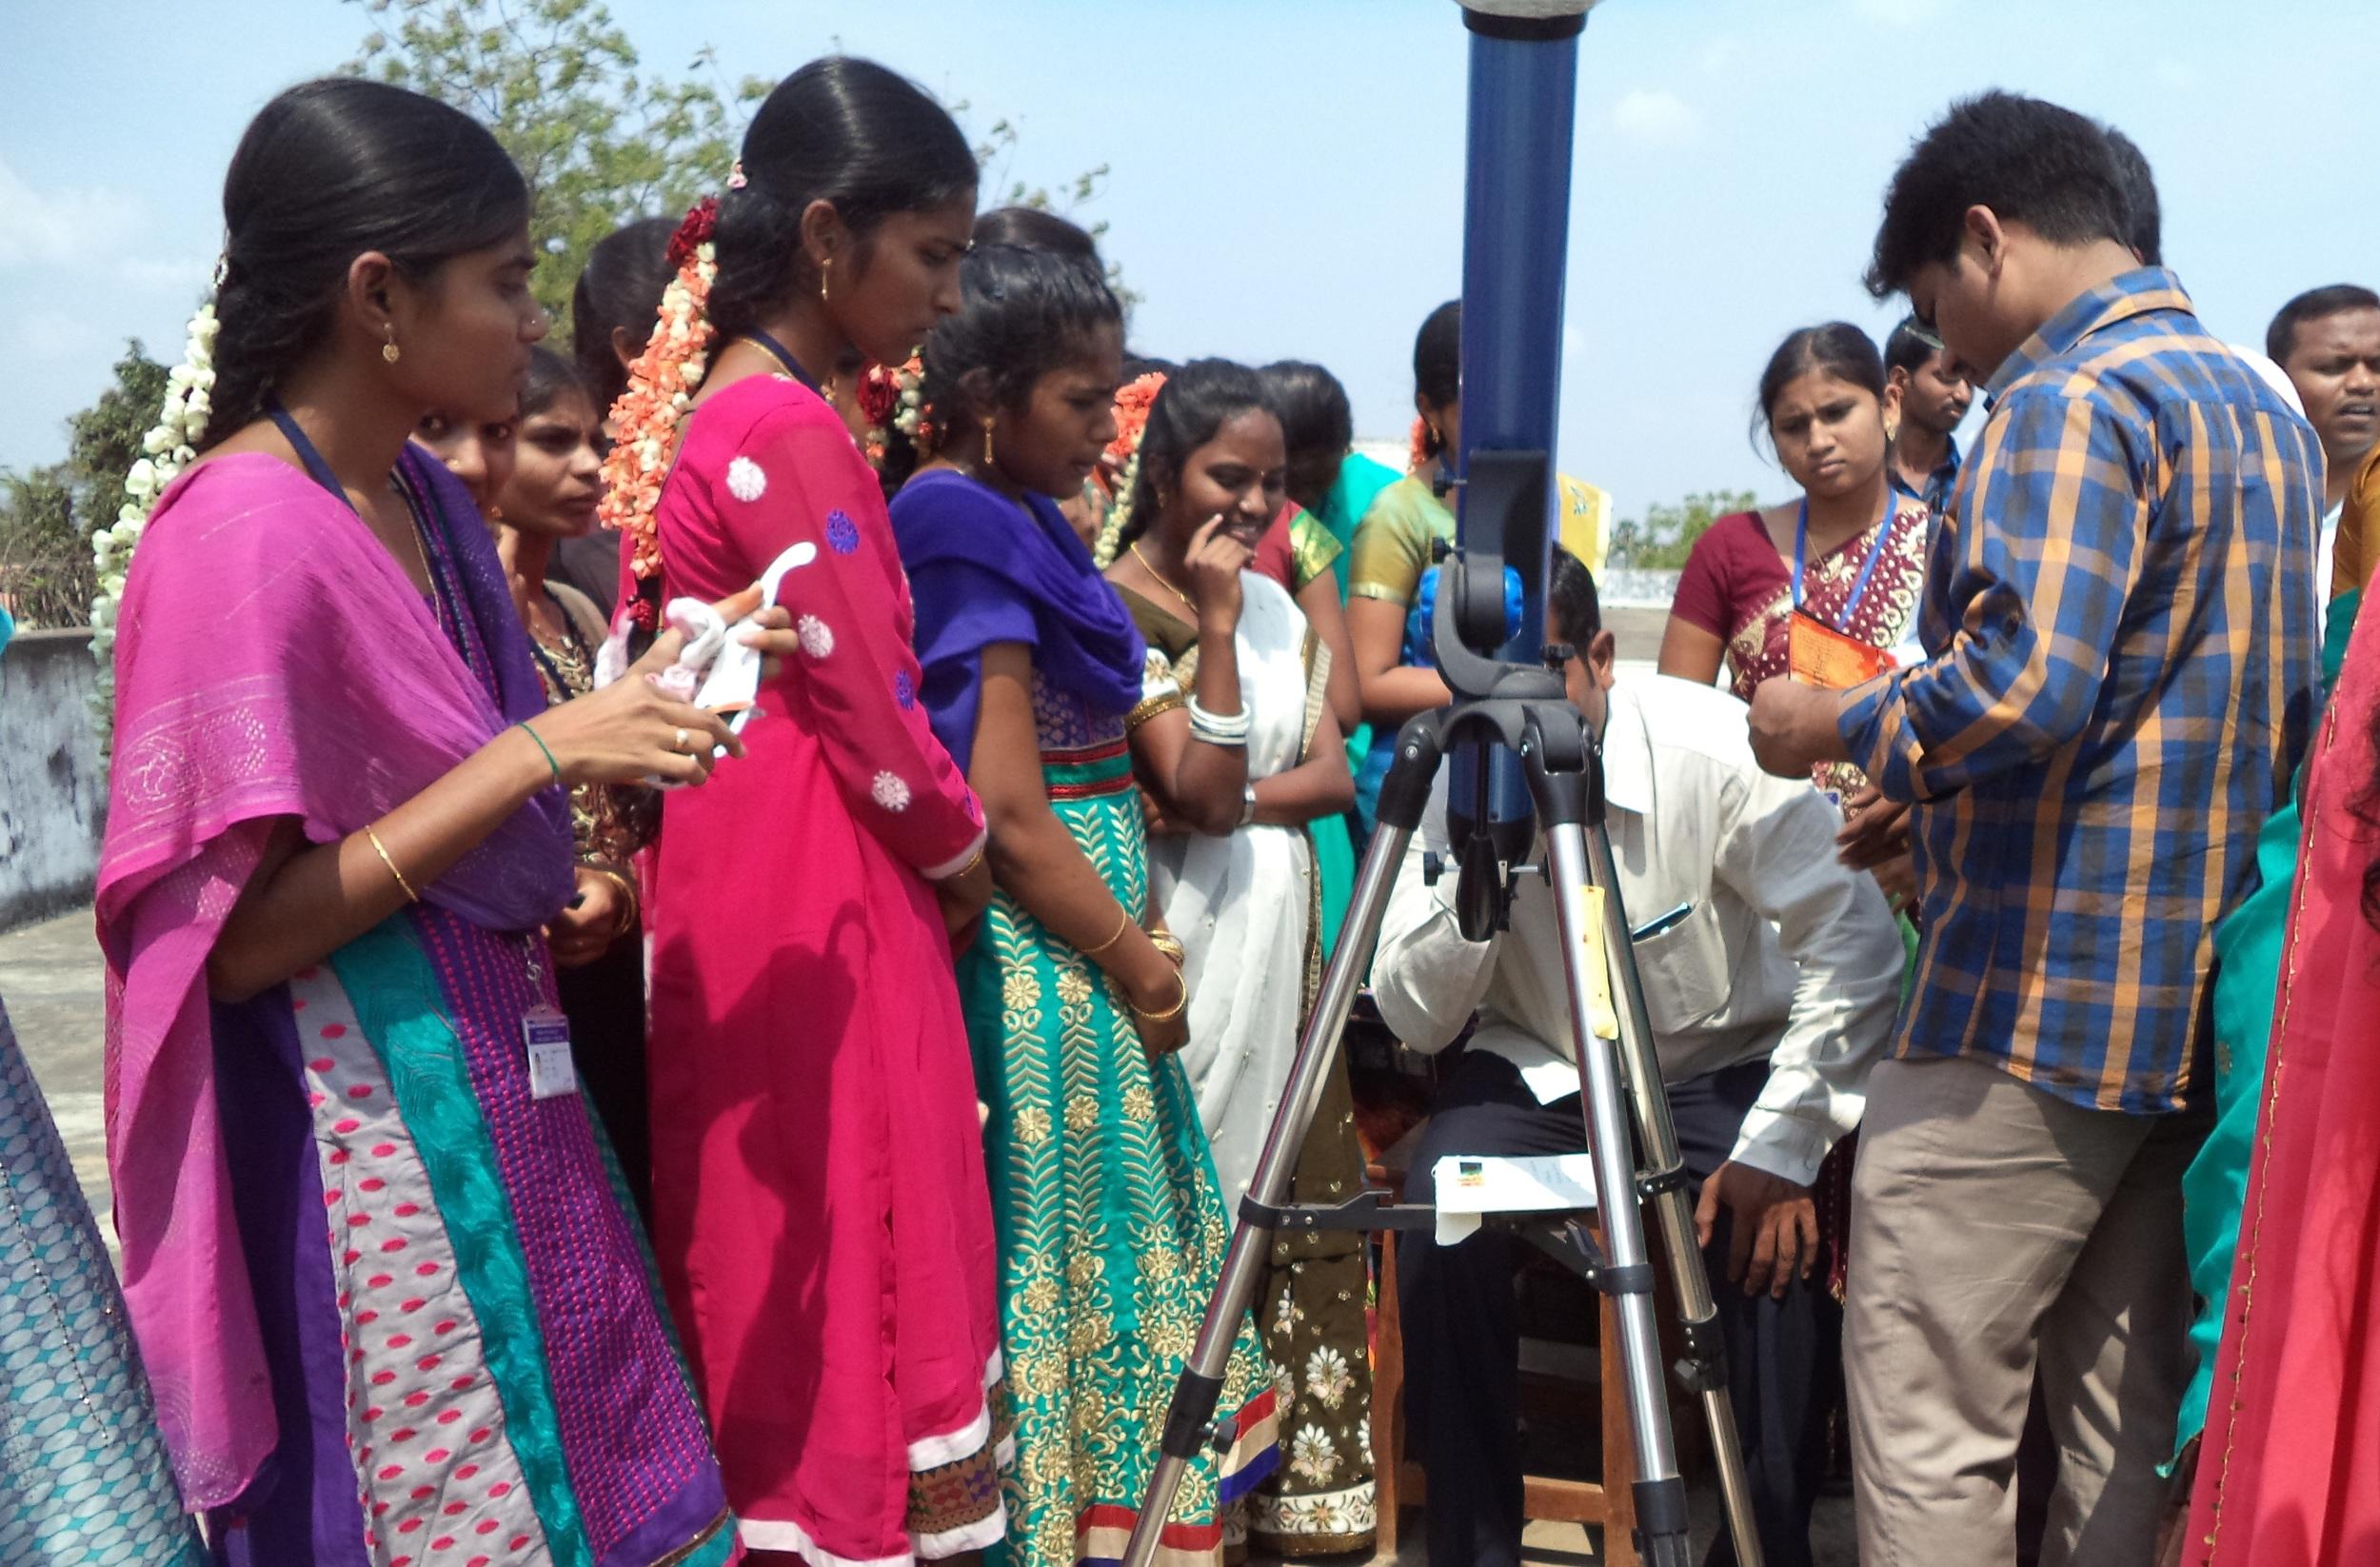 Solar astronomy outreach in India